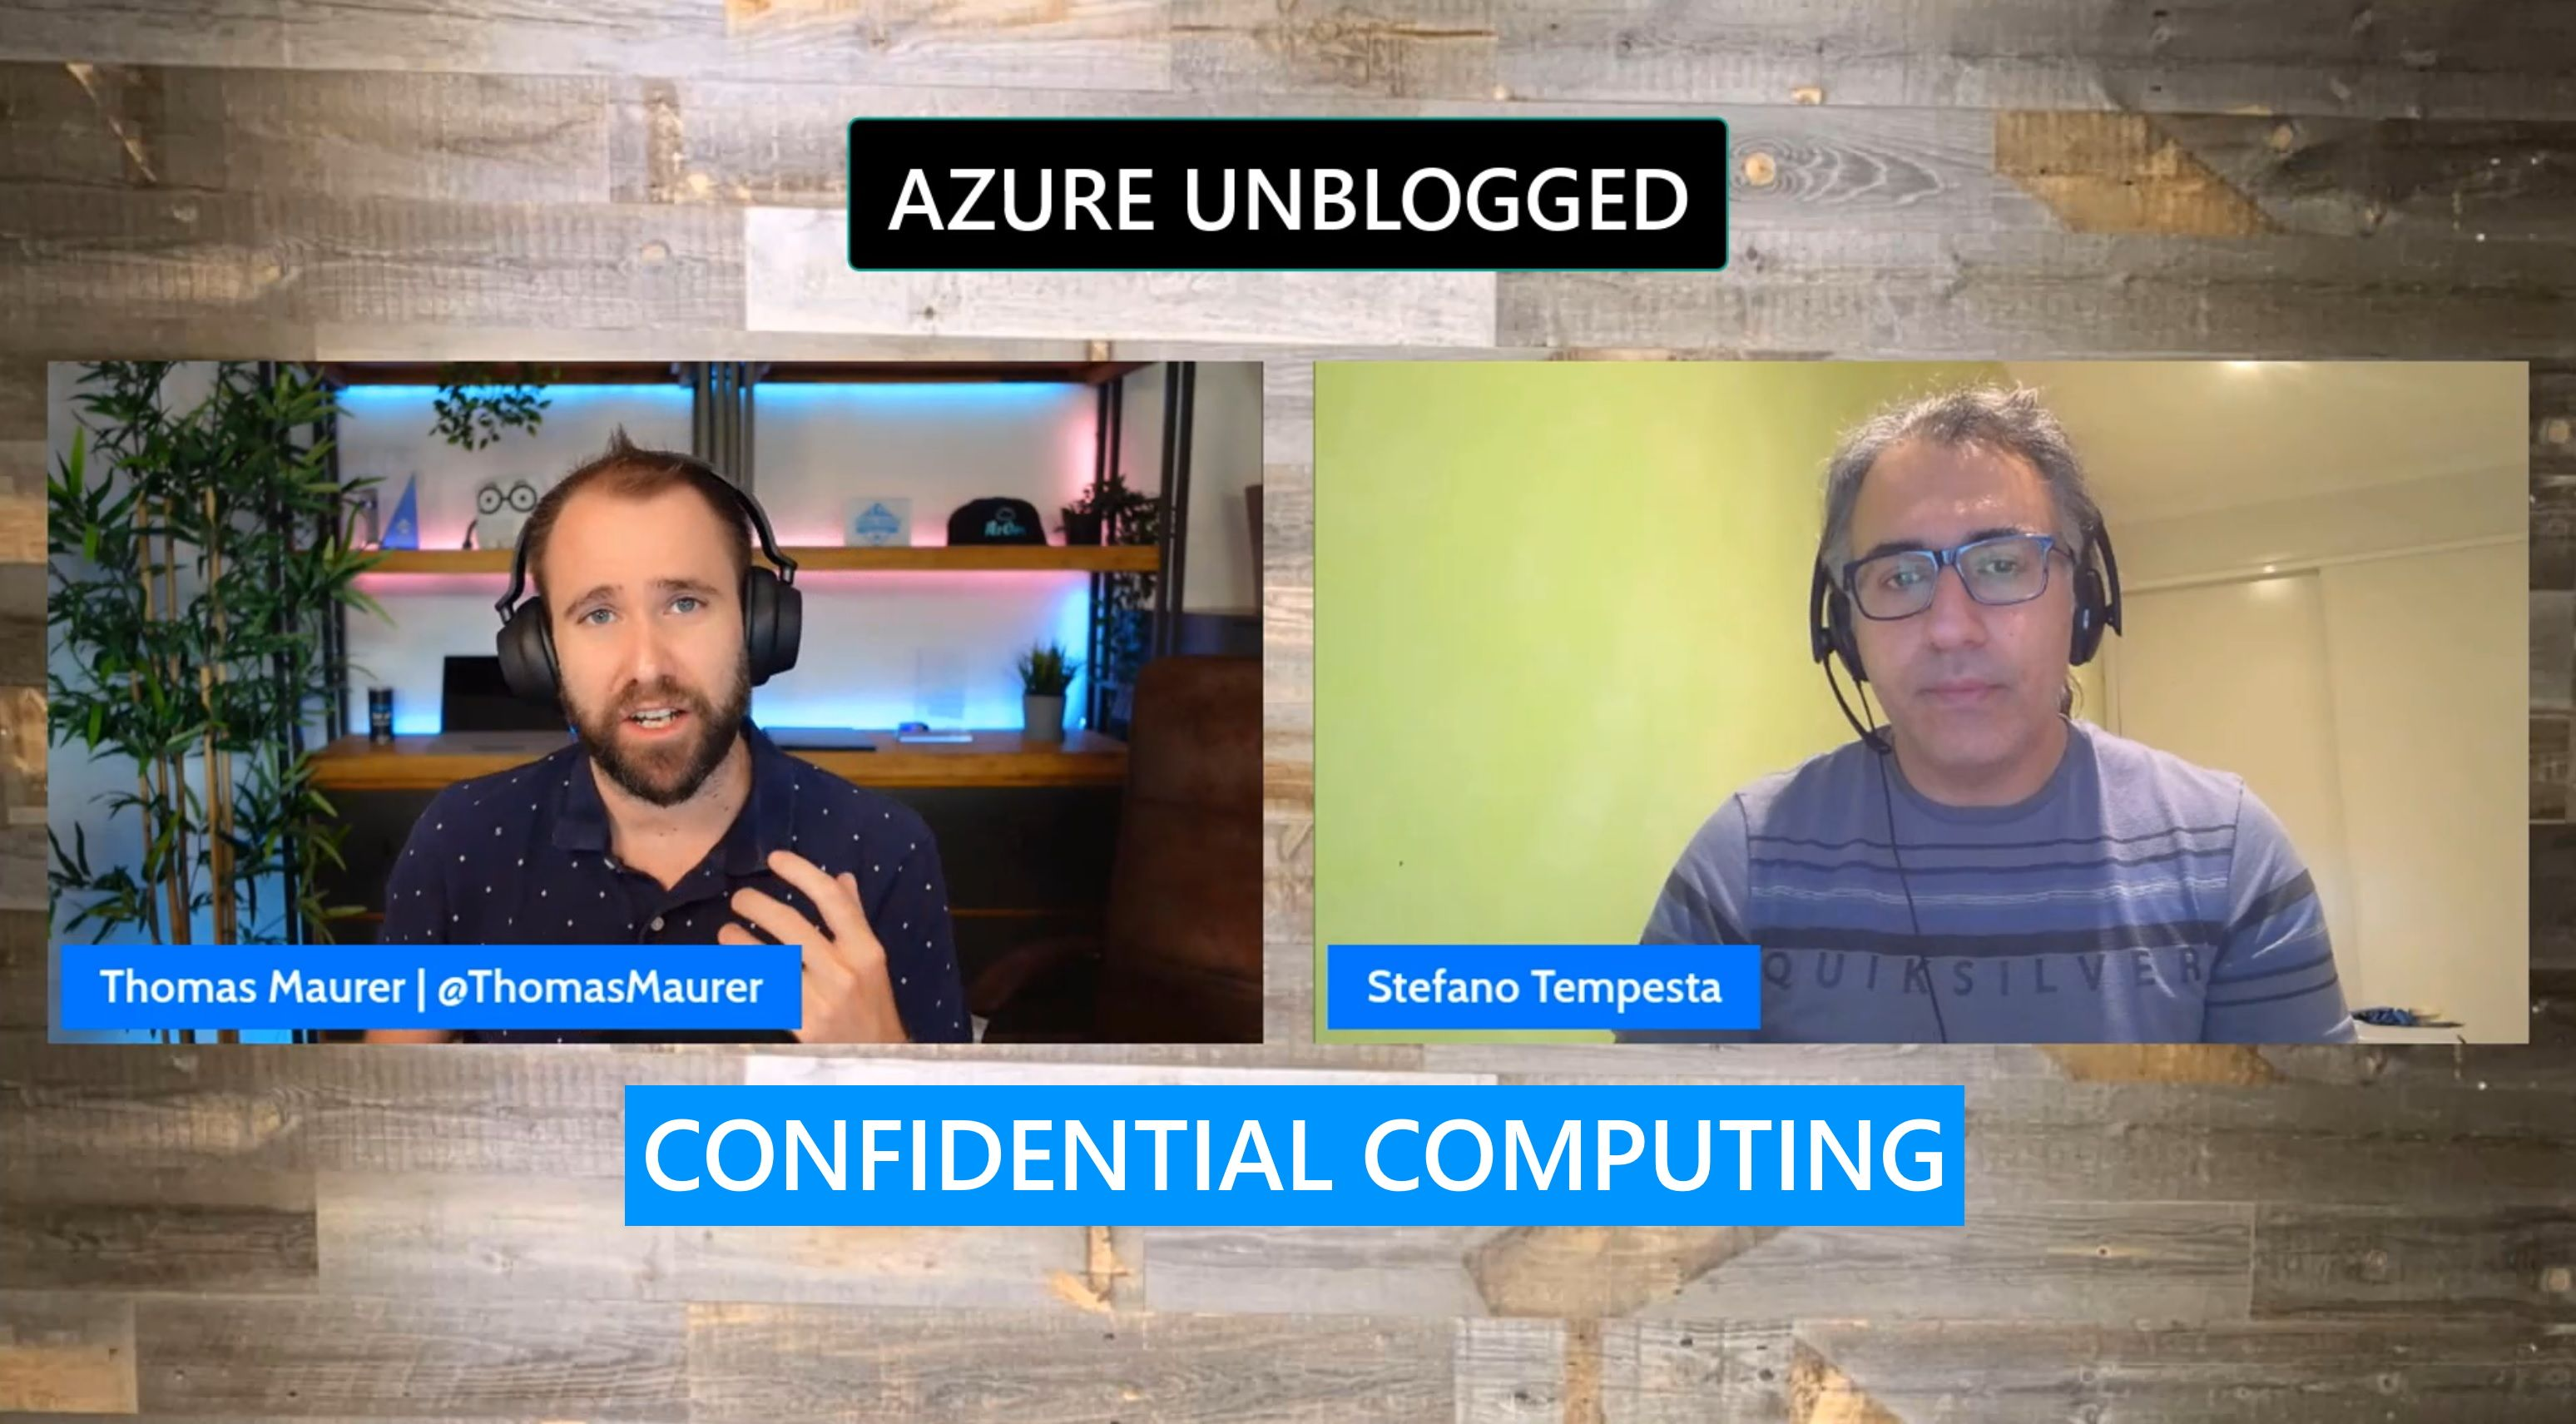 Azure Unblogged - Azure Confidential Computing